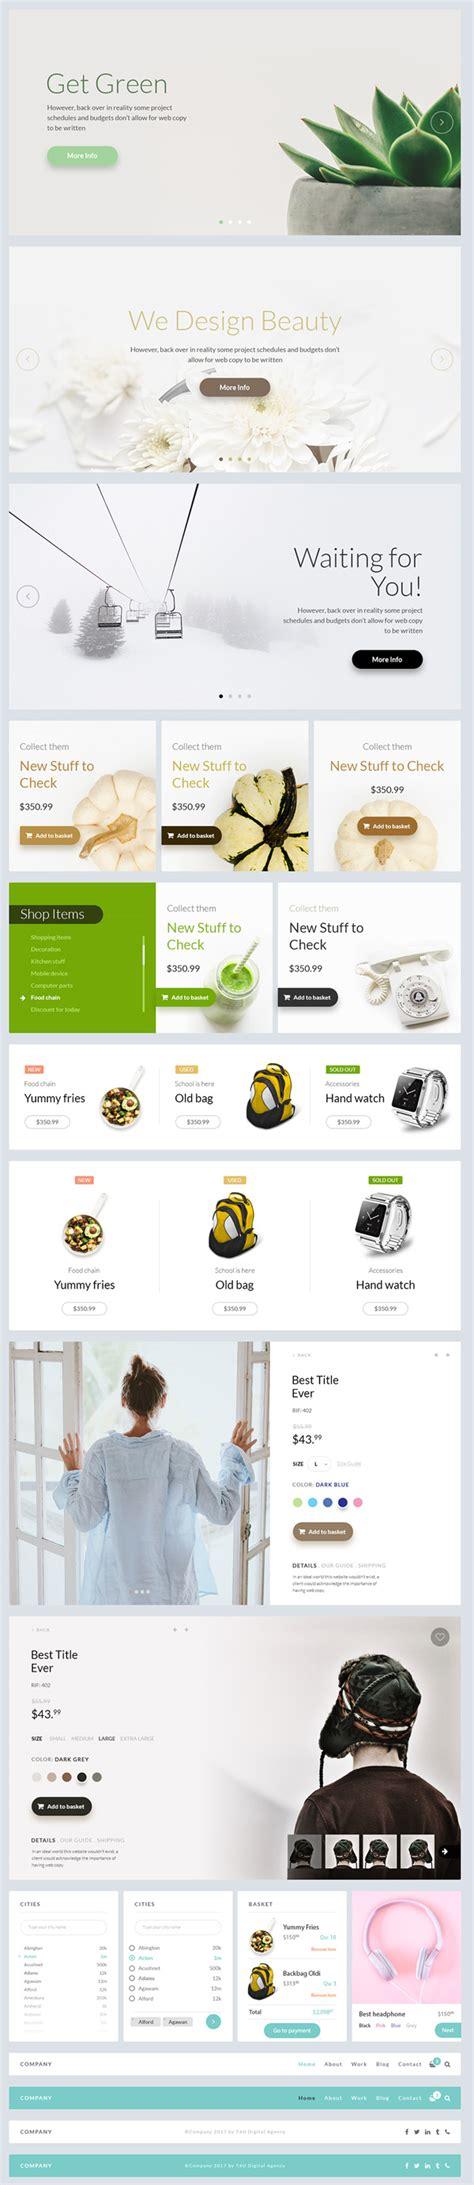 20 free and new psd ui kits 20 free modern ui design elements psd ui kits download